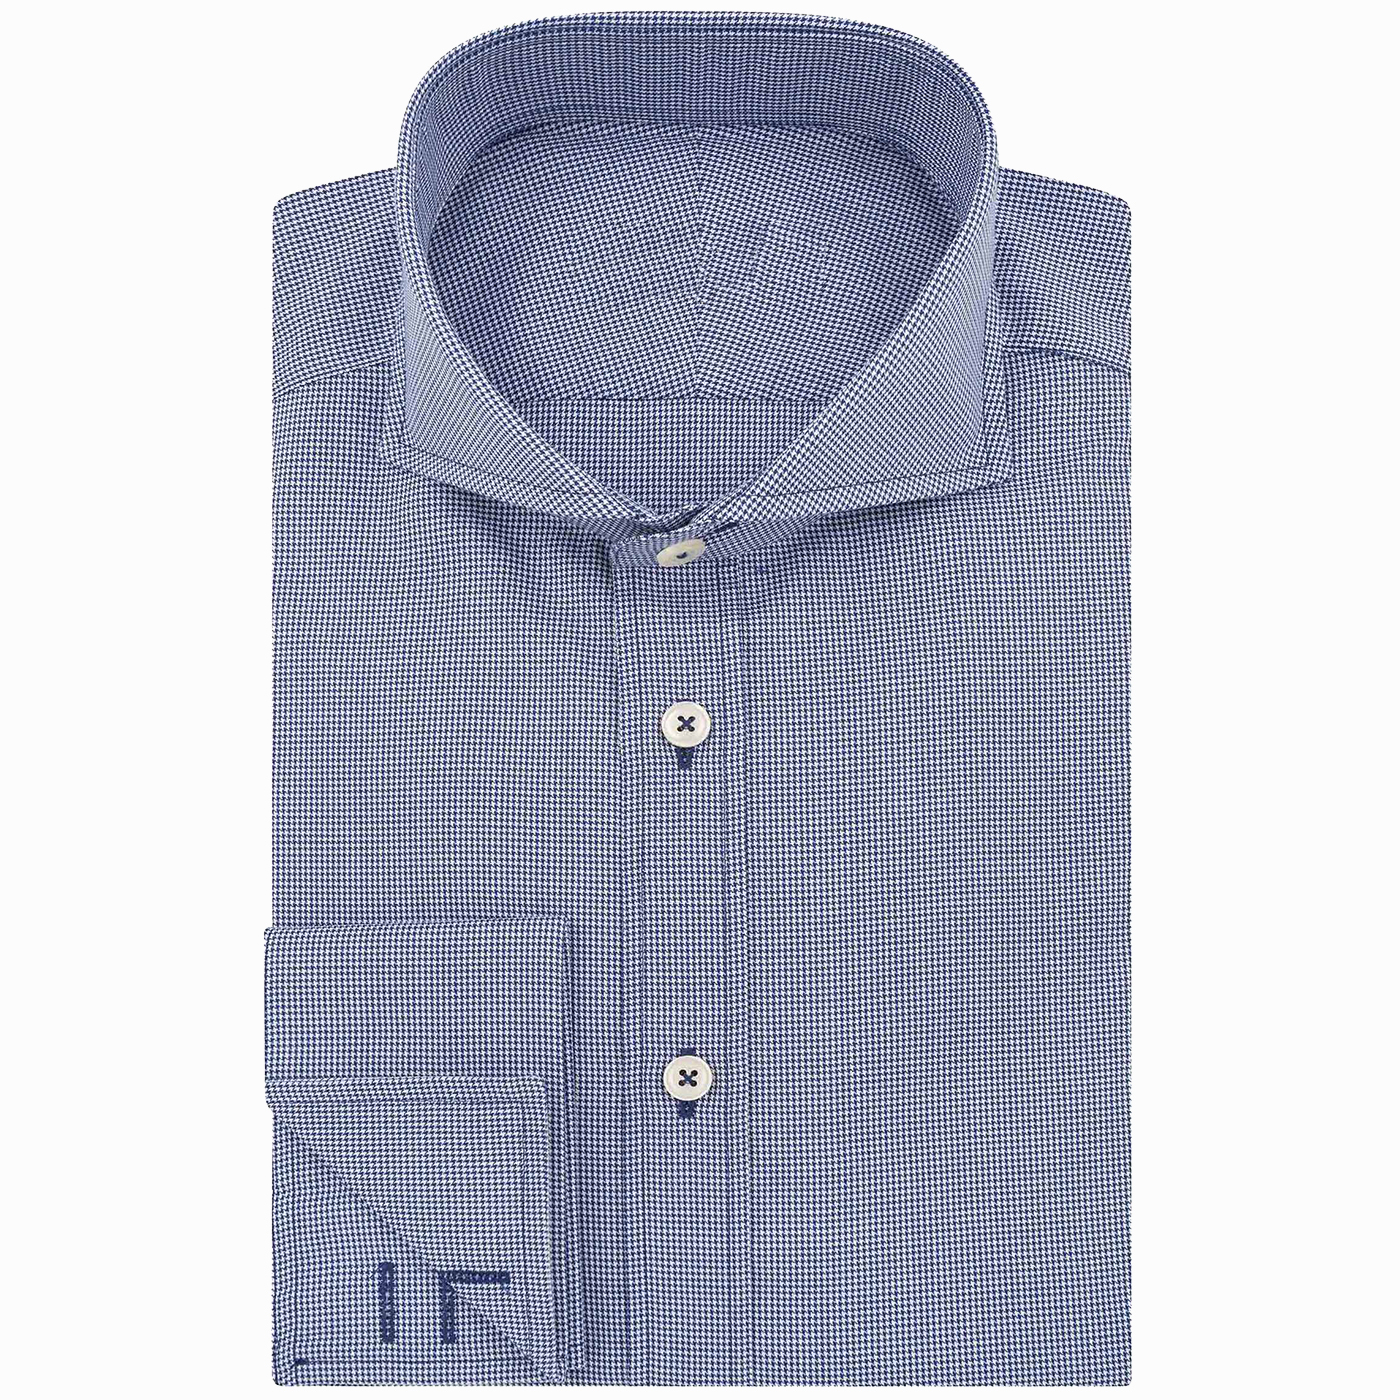 Shirt_12_Houndstooth_navy.jpg